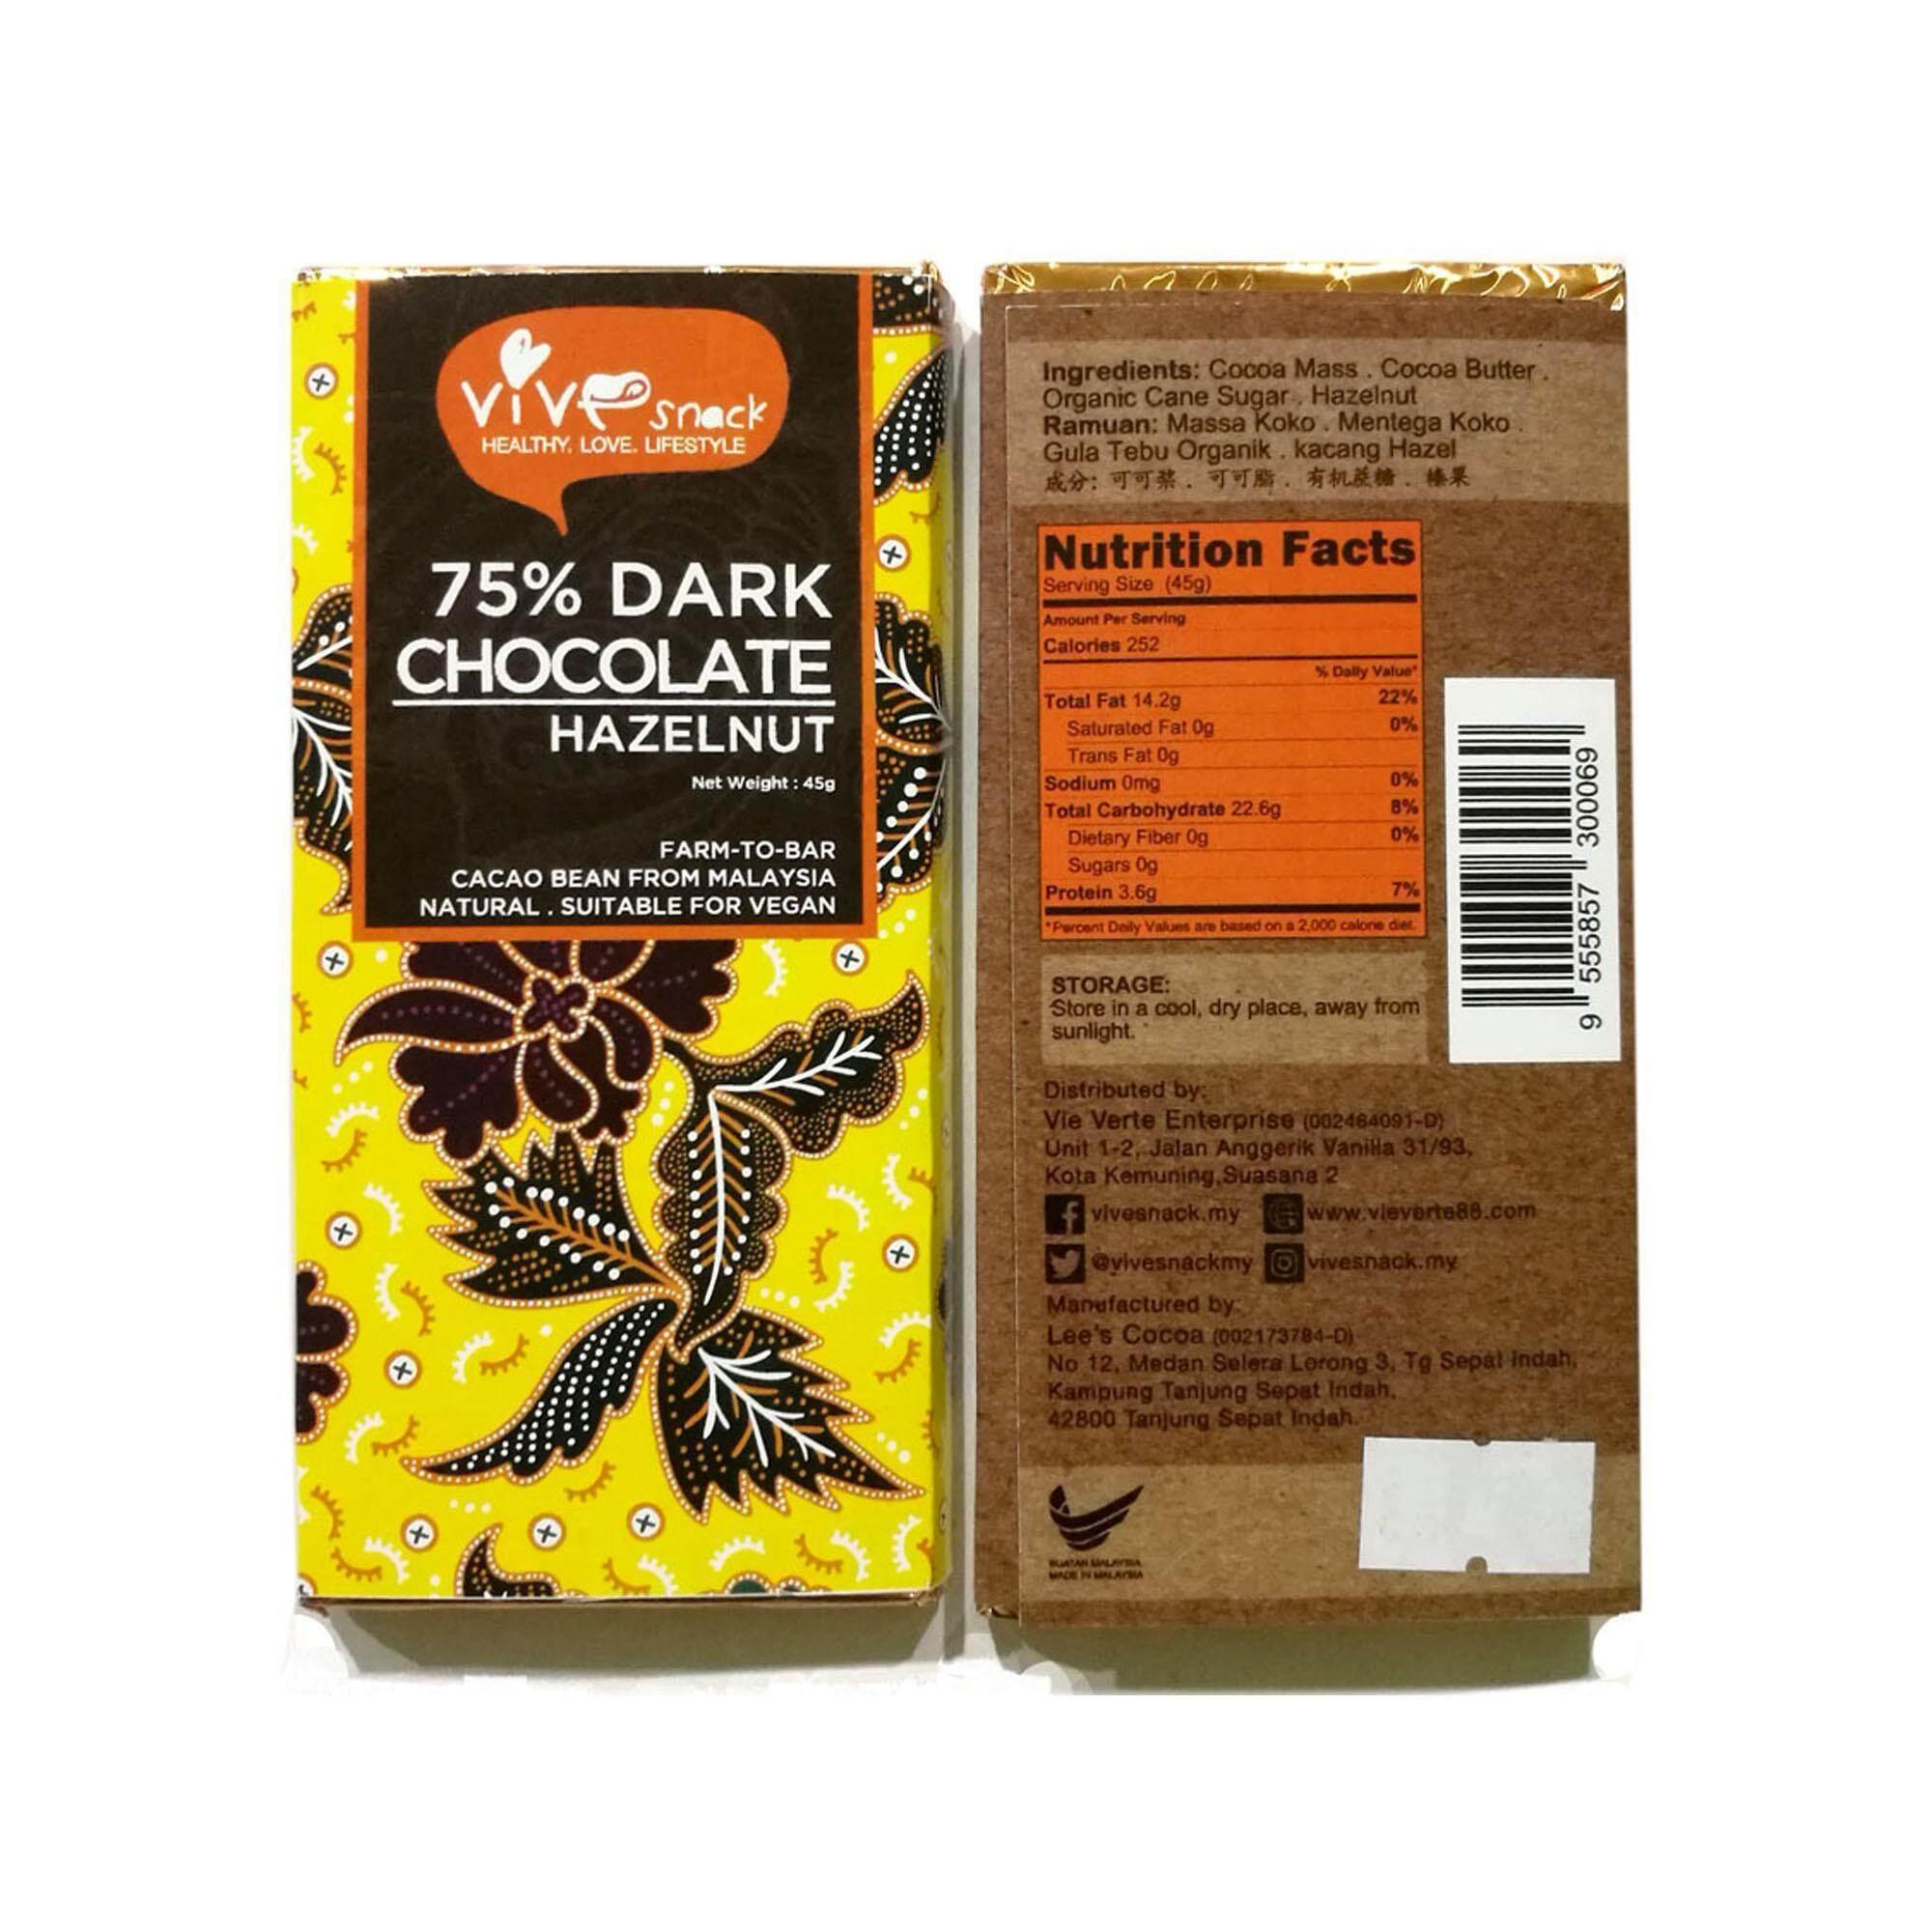 ViVe Snack 75% Dark Chocolate (Hazelnut) 45g x 2 - TWIN PACK